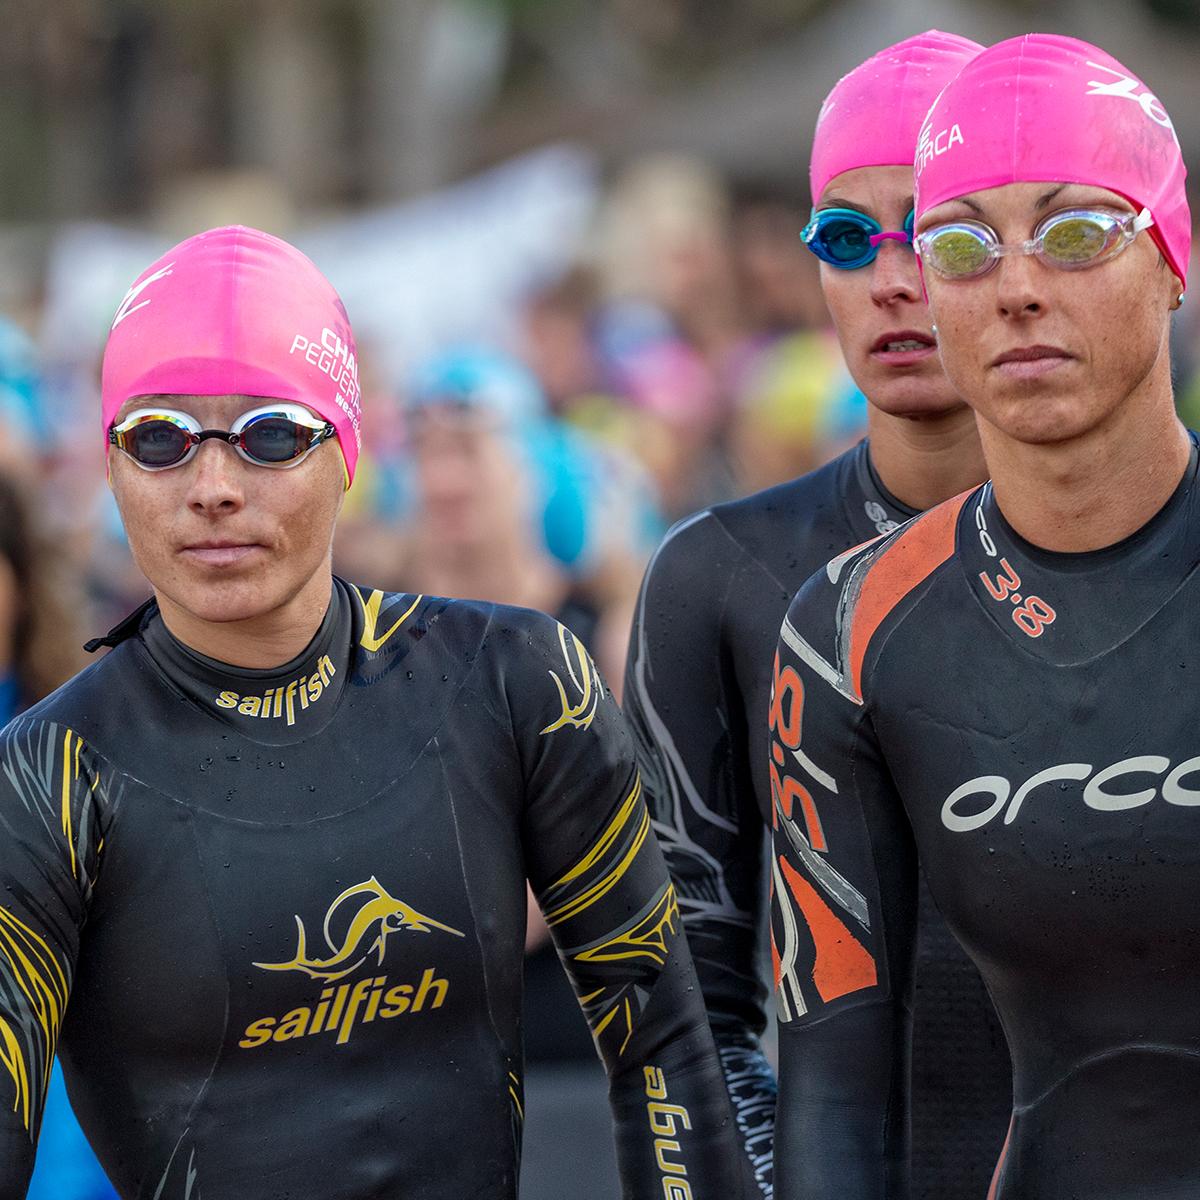 Swim - Challenge Peguera Mallorca race magazine 2020 triathlon